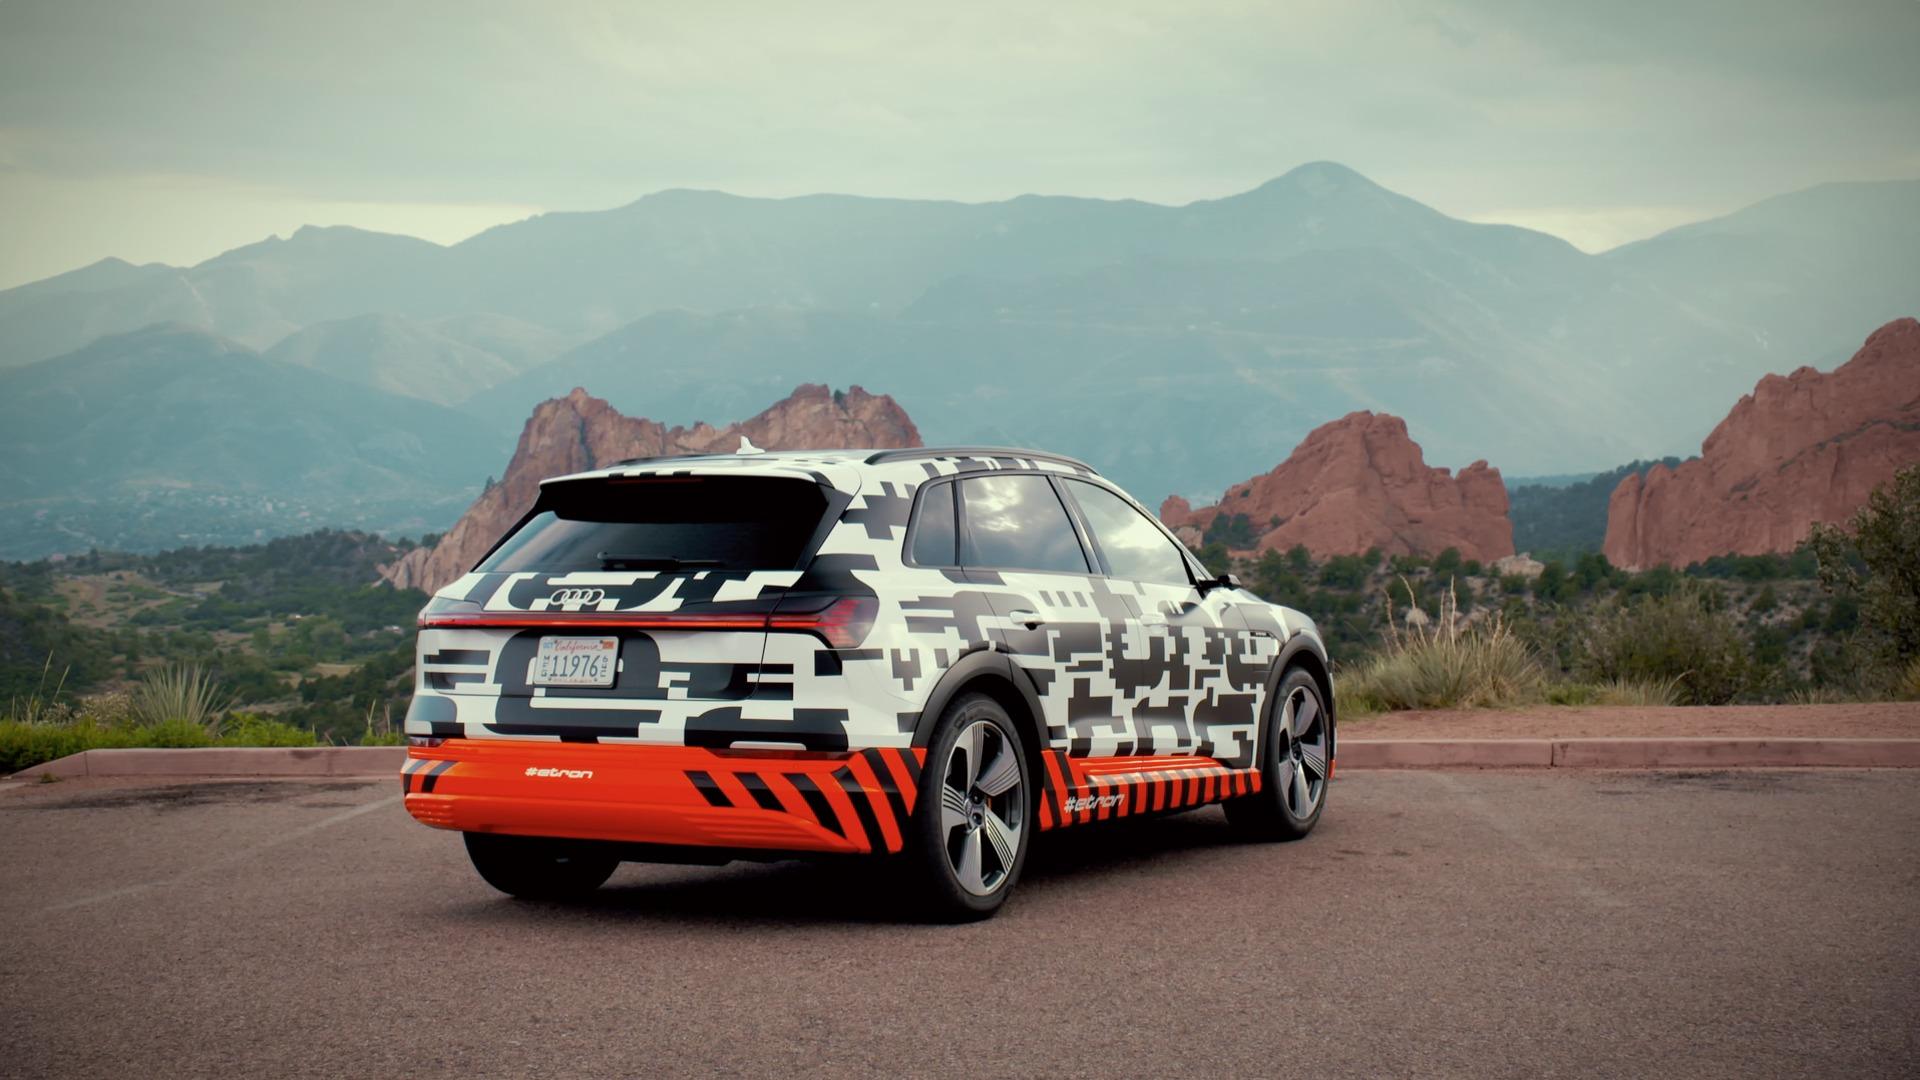 Gipfelstürmer – der Audi e-tron Prototyp im Rekuperationstest am Pikes Peak